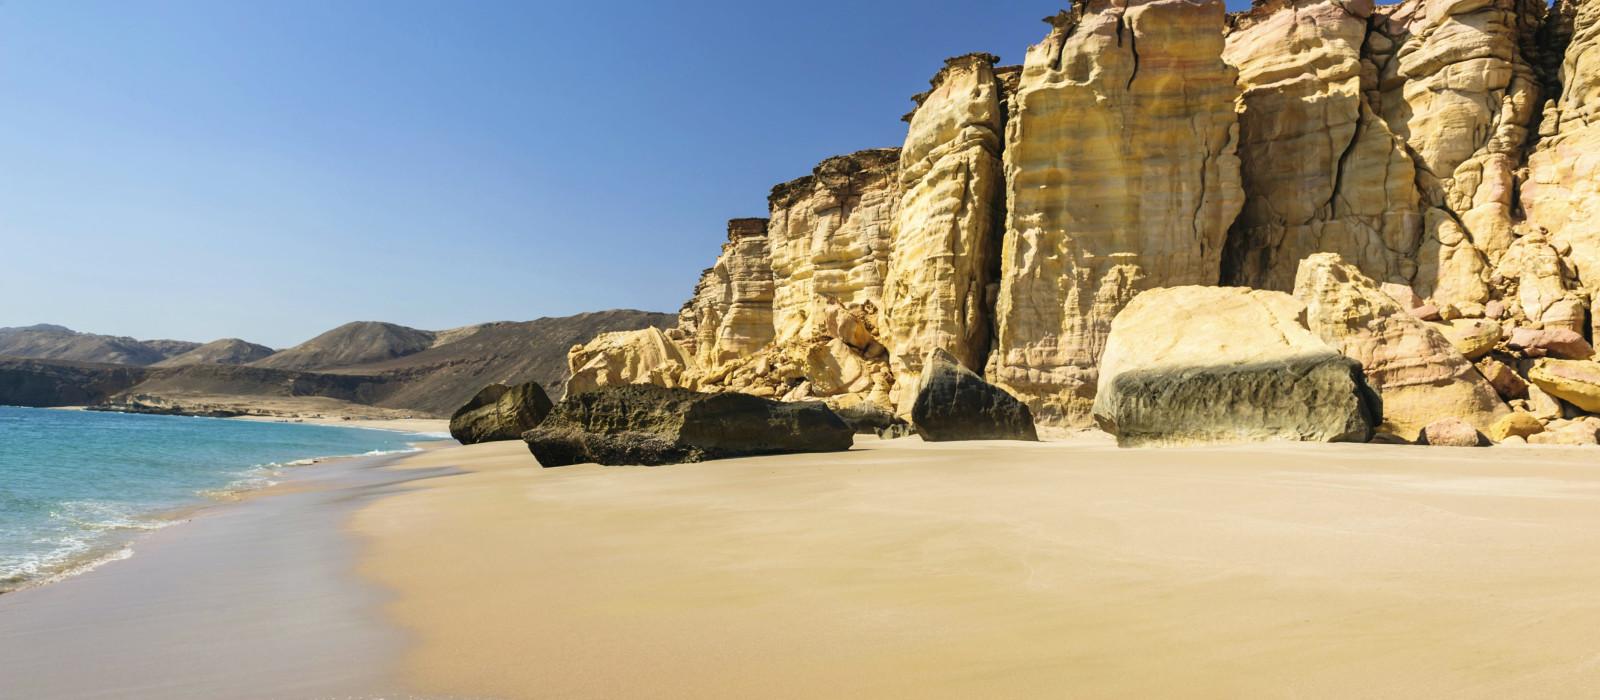 Destination Ras Al Jinz Oman